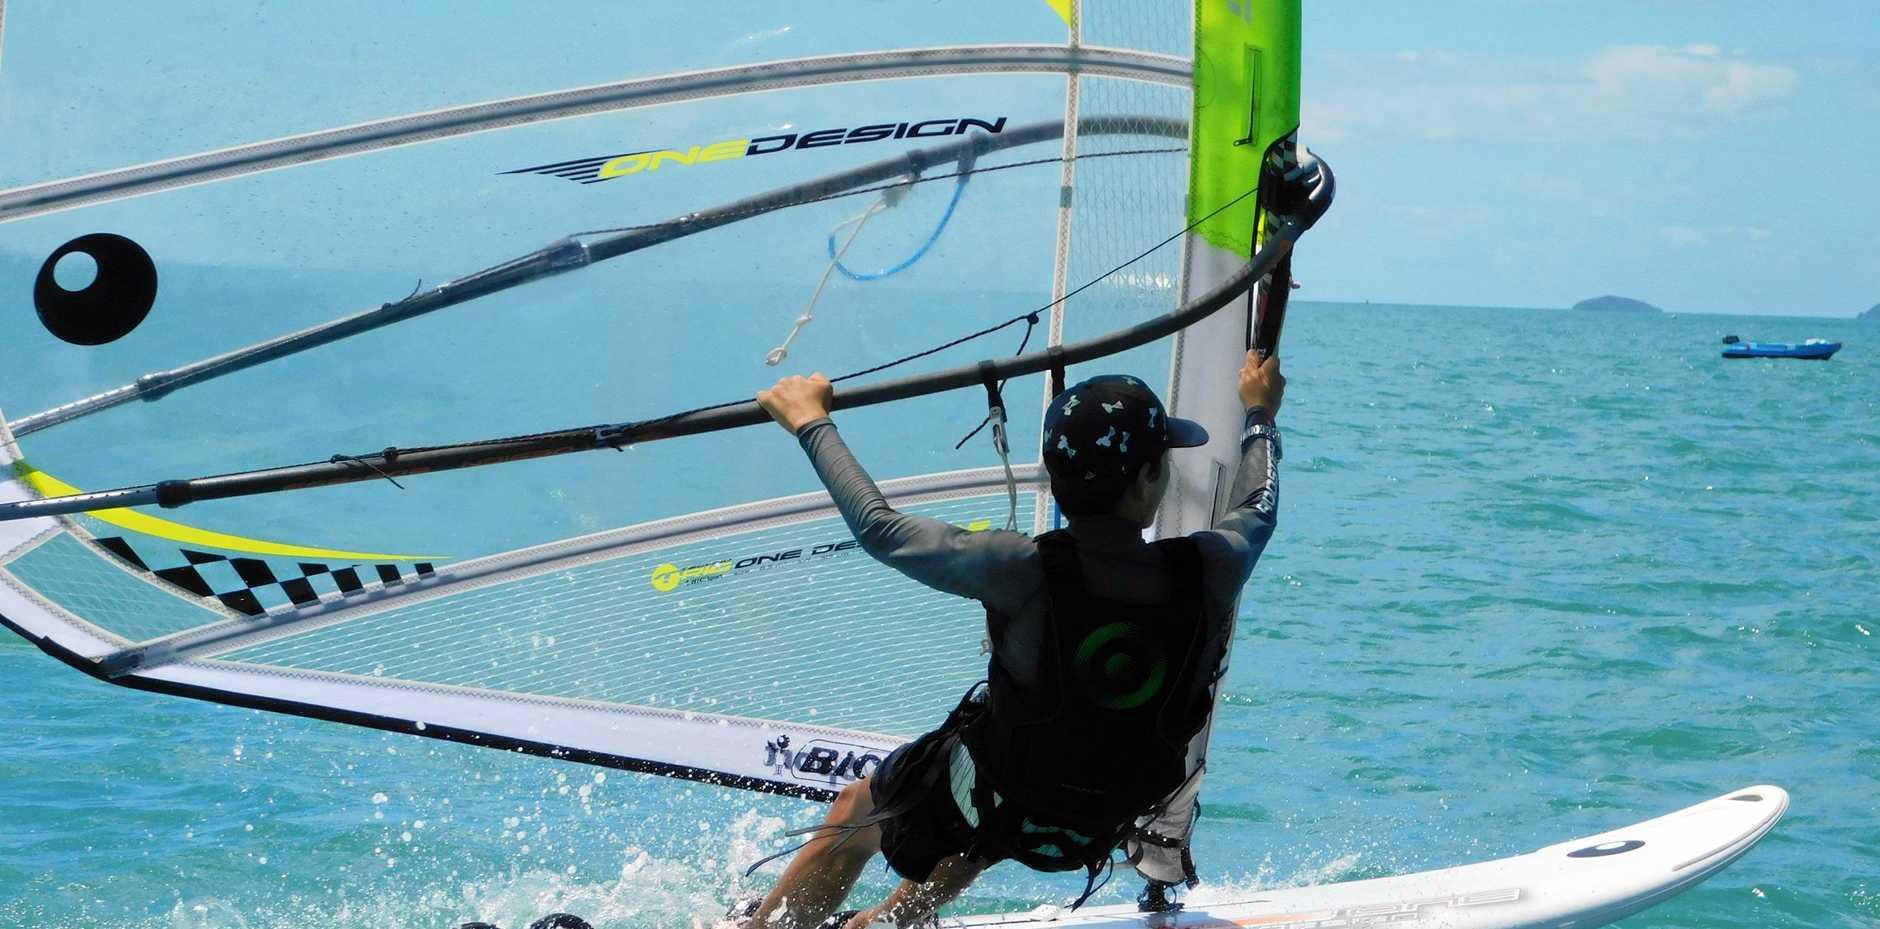 Hamish Swain on his sailboard.